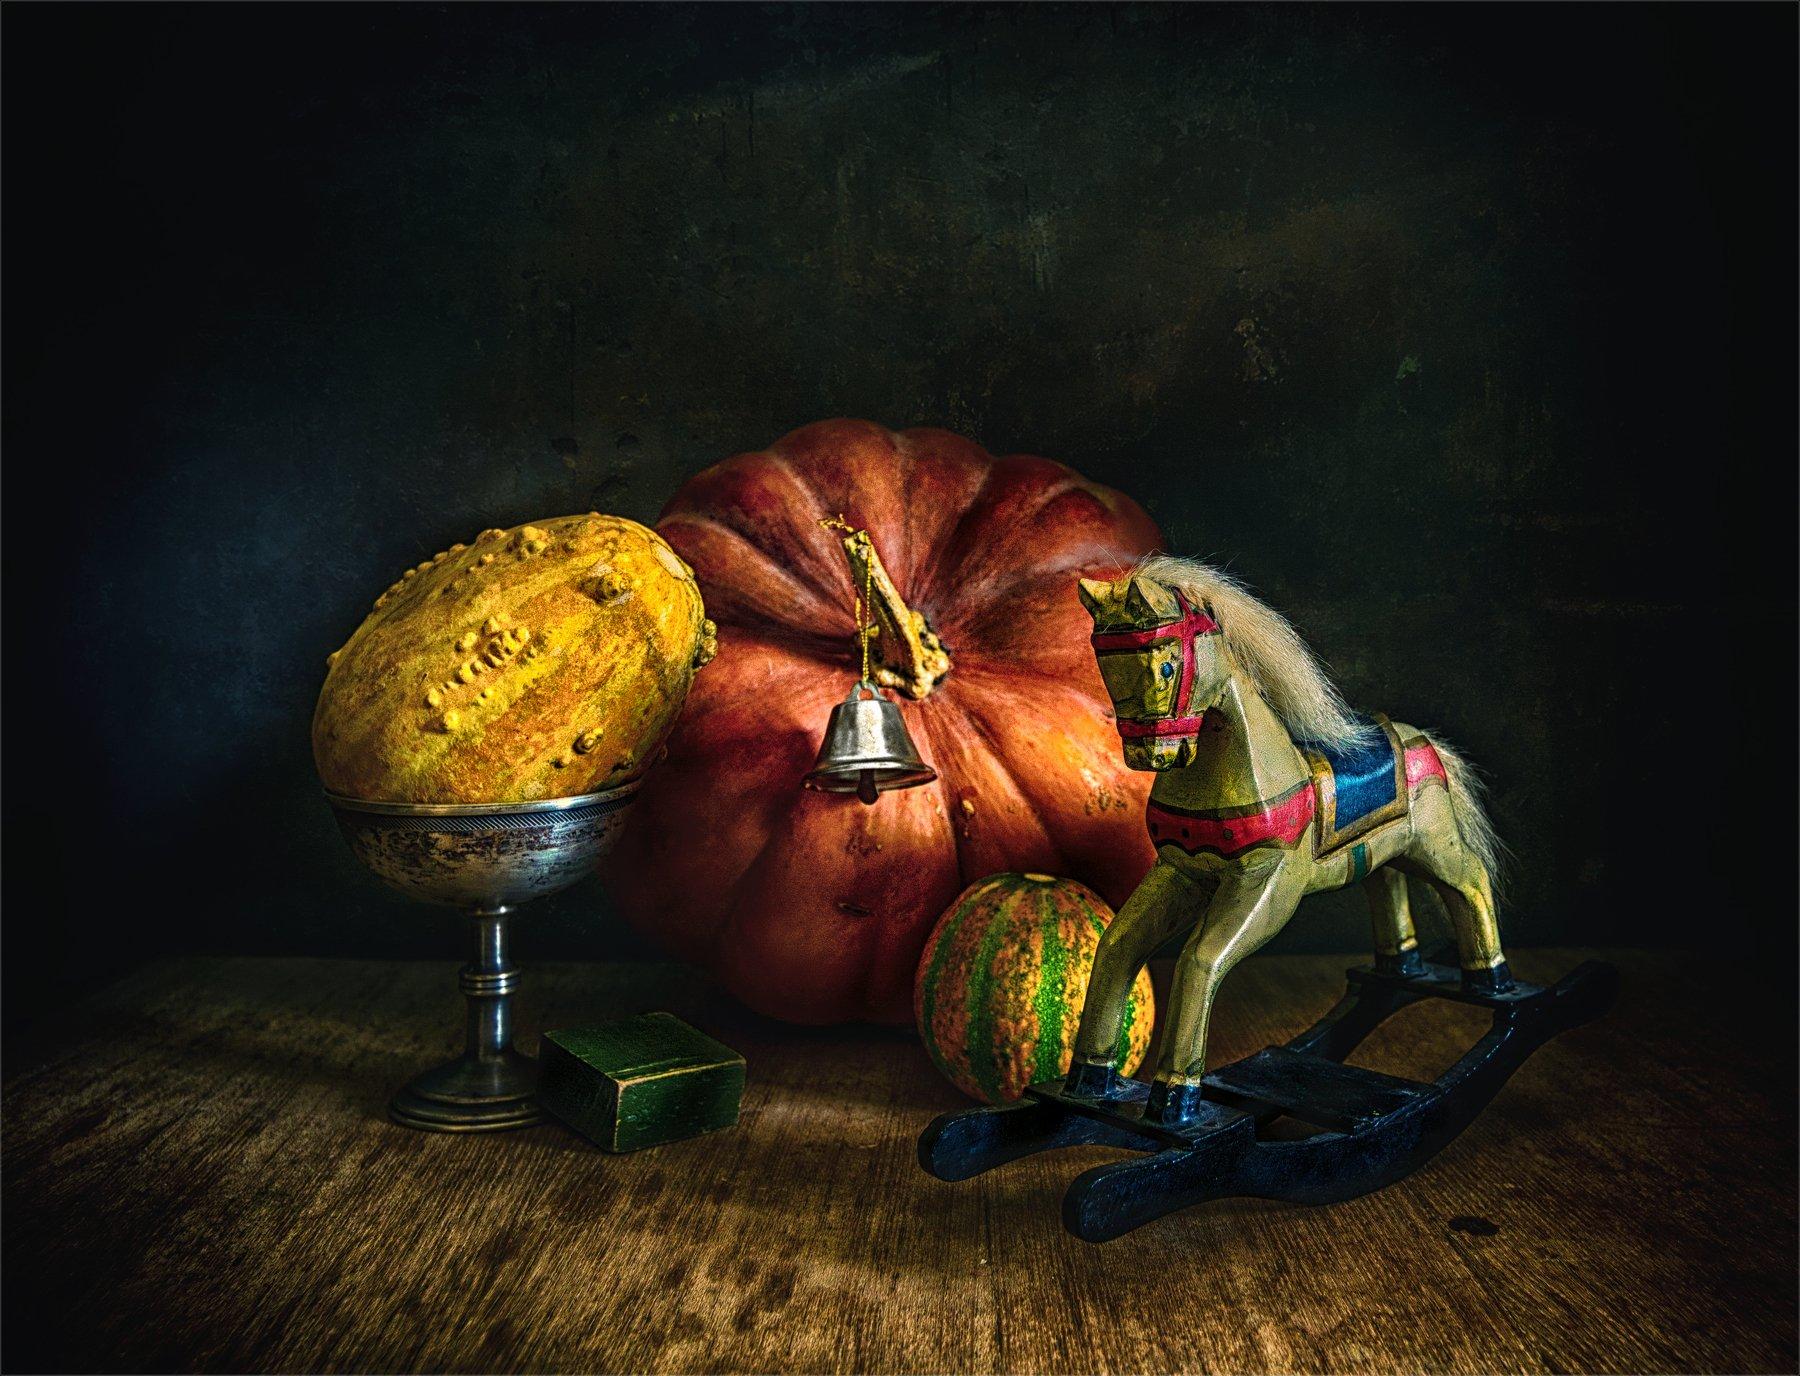 still life, натюрморт,   винтаж, ретро, тыква, колокольчик, лошадка, игрушка, креманка, Михаил MSH